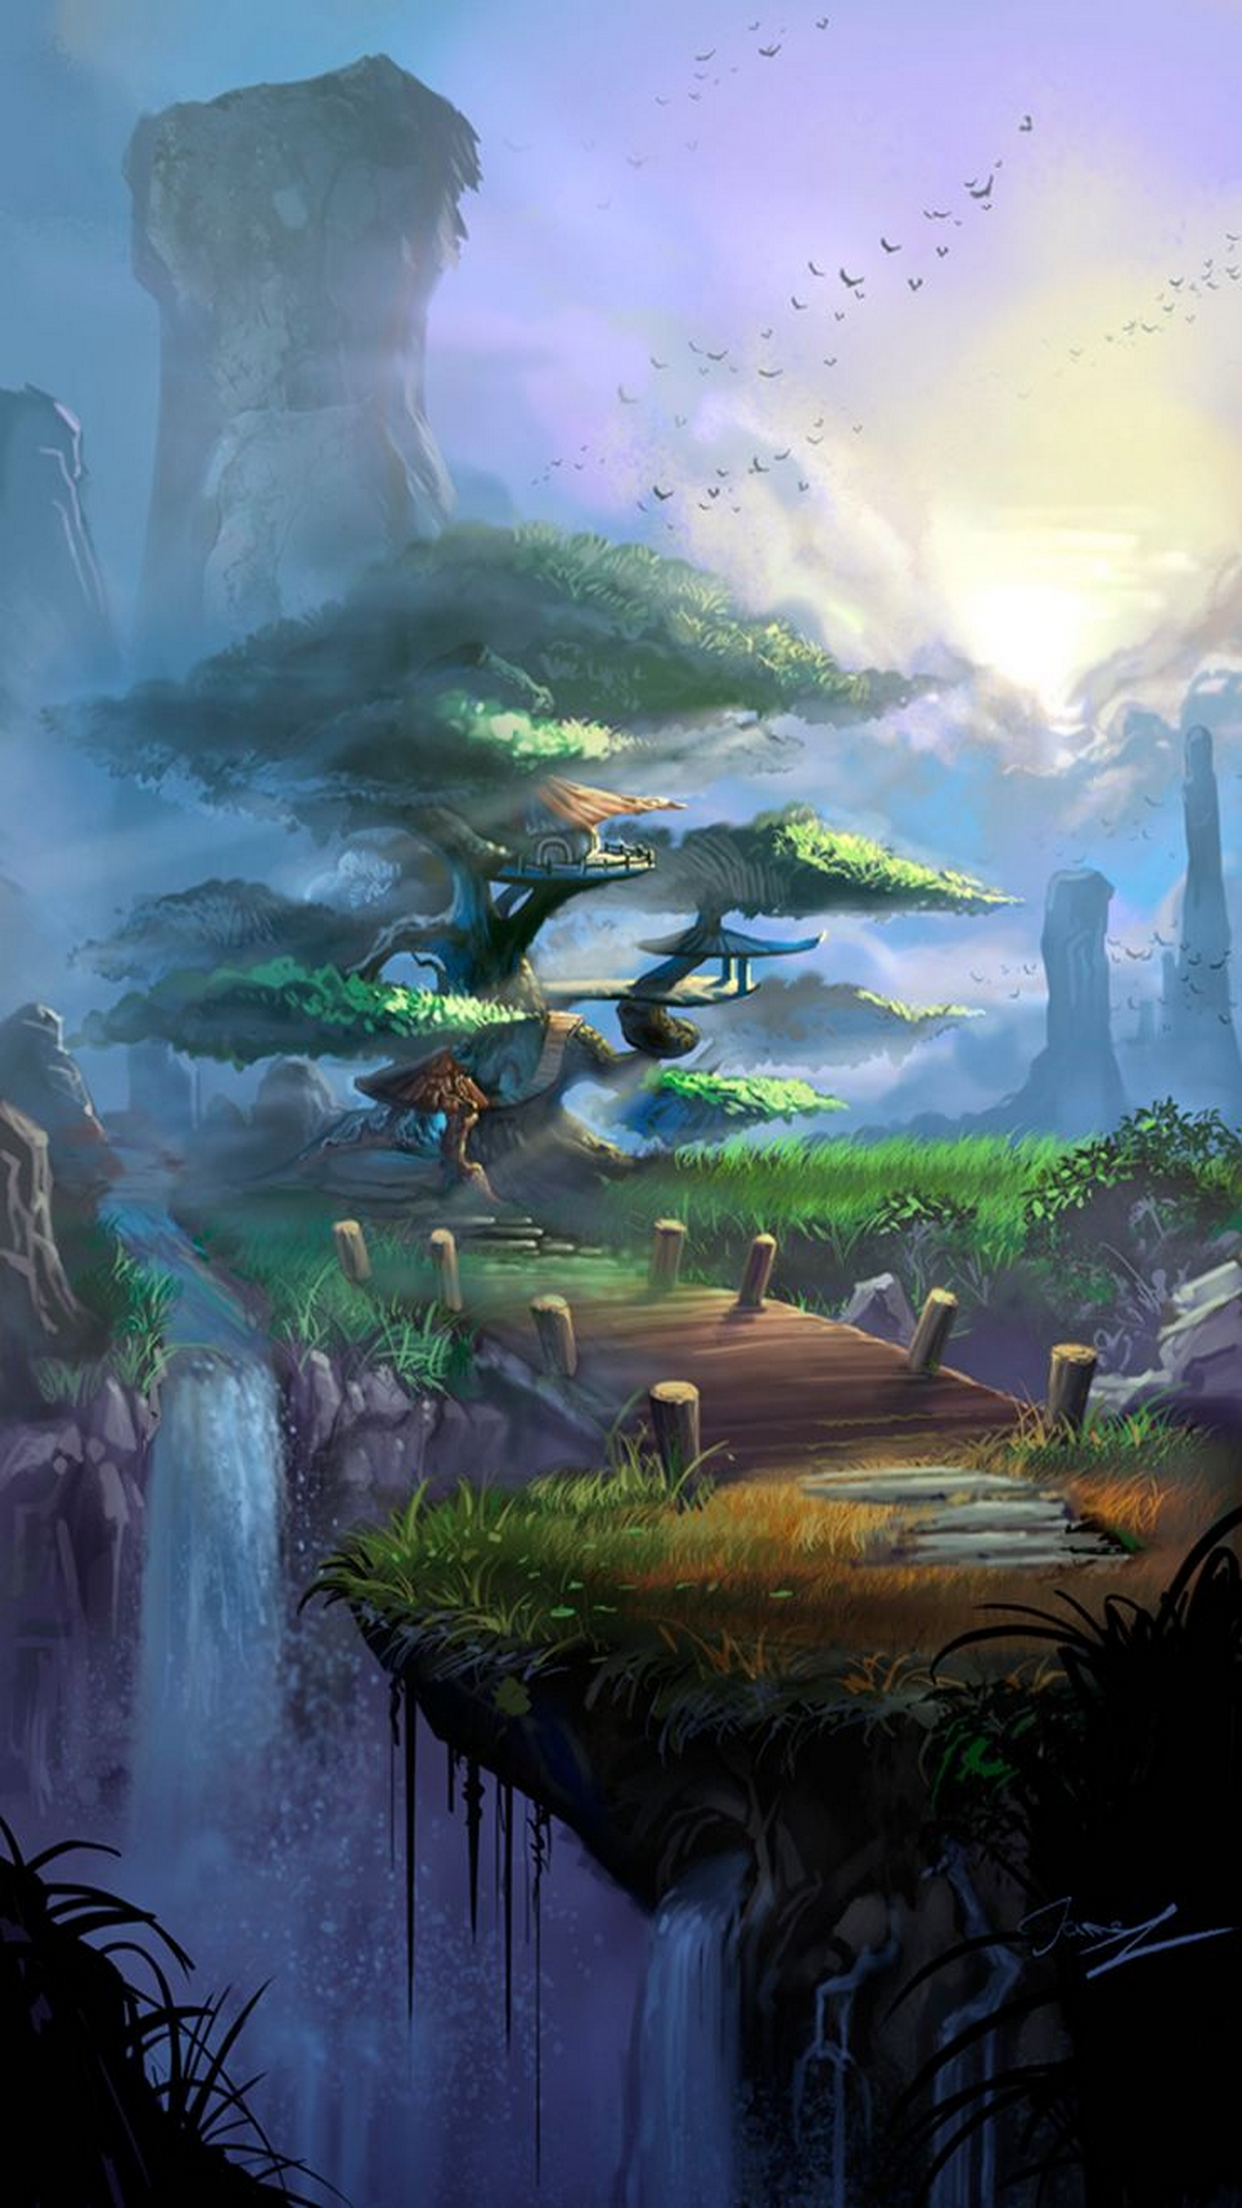 Wallpaper For Iphone   Beautiful Fantasy Landscape Art   1242x2208 1242x2208